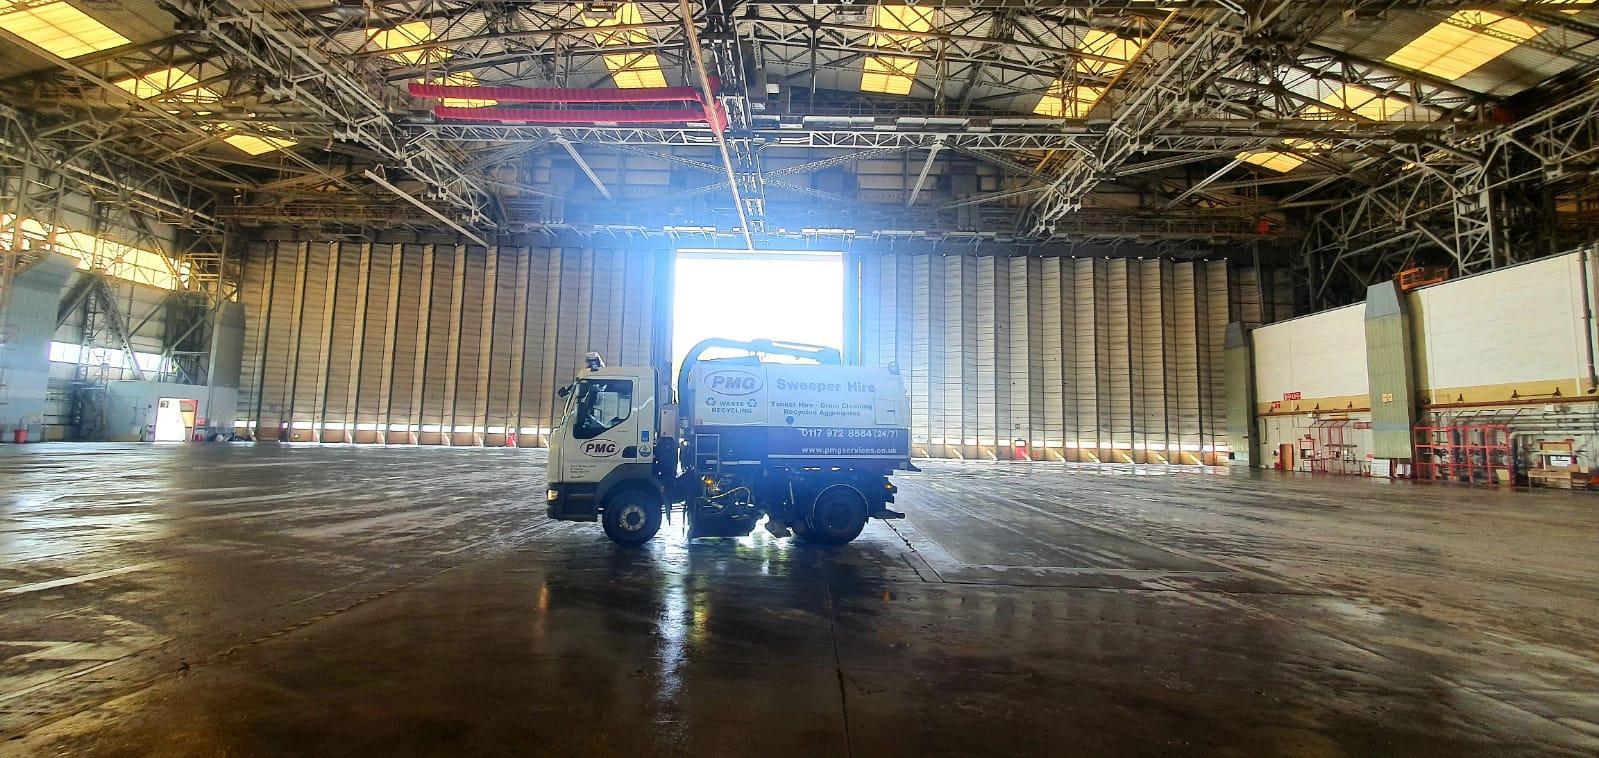 Road sweeper at Brabazon Hangar